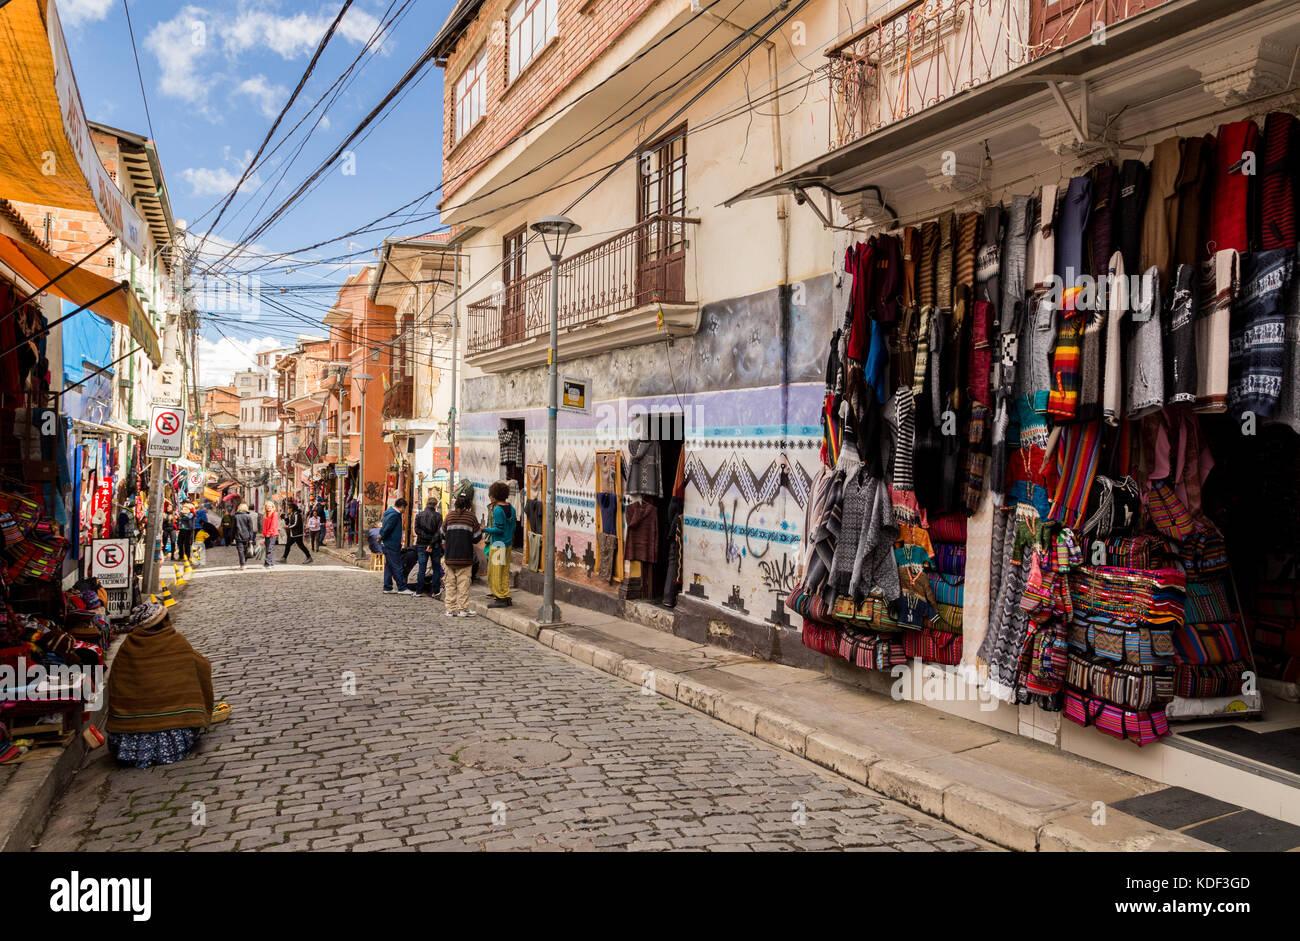 Witches' Market, La Paz, Bolivia - Stock Image